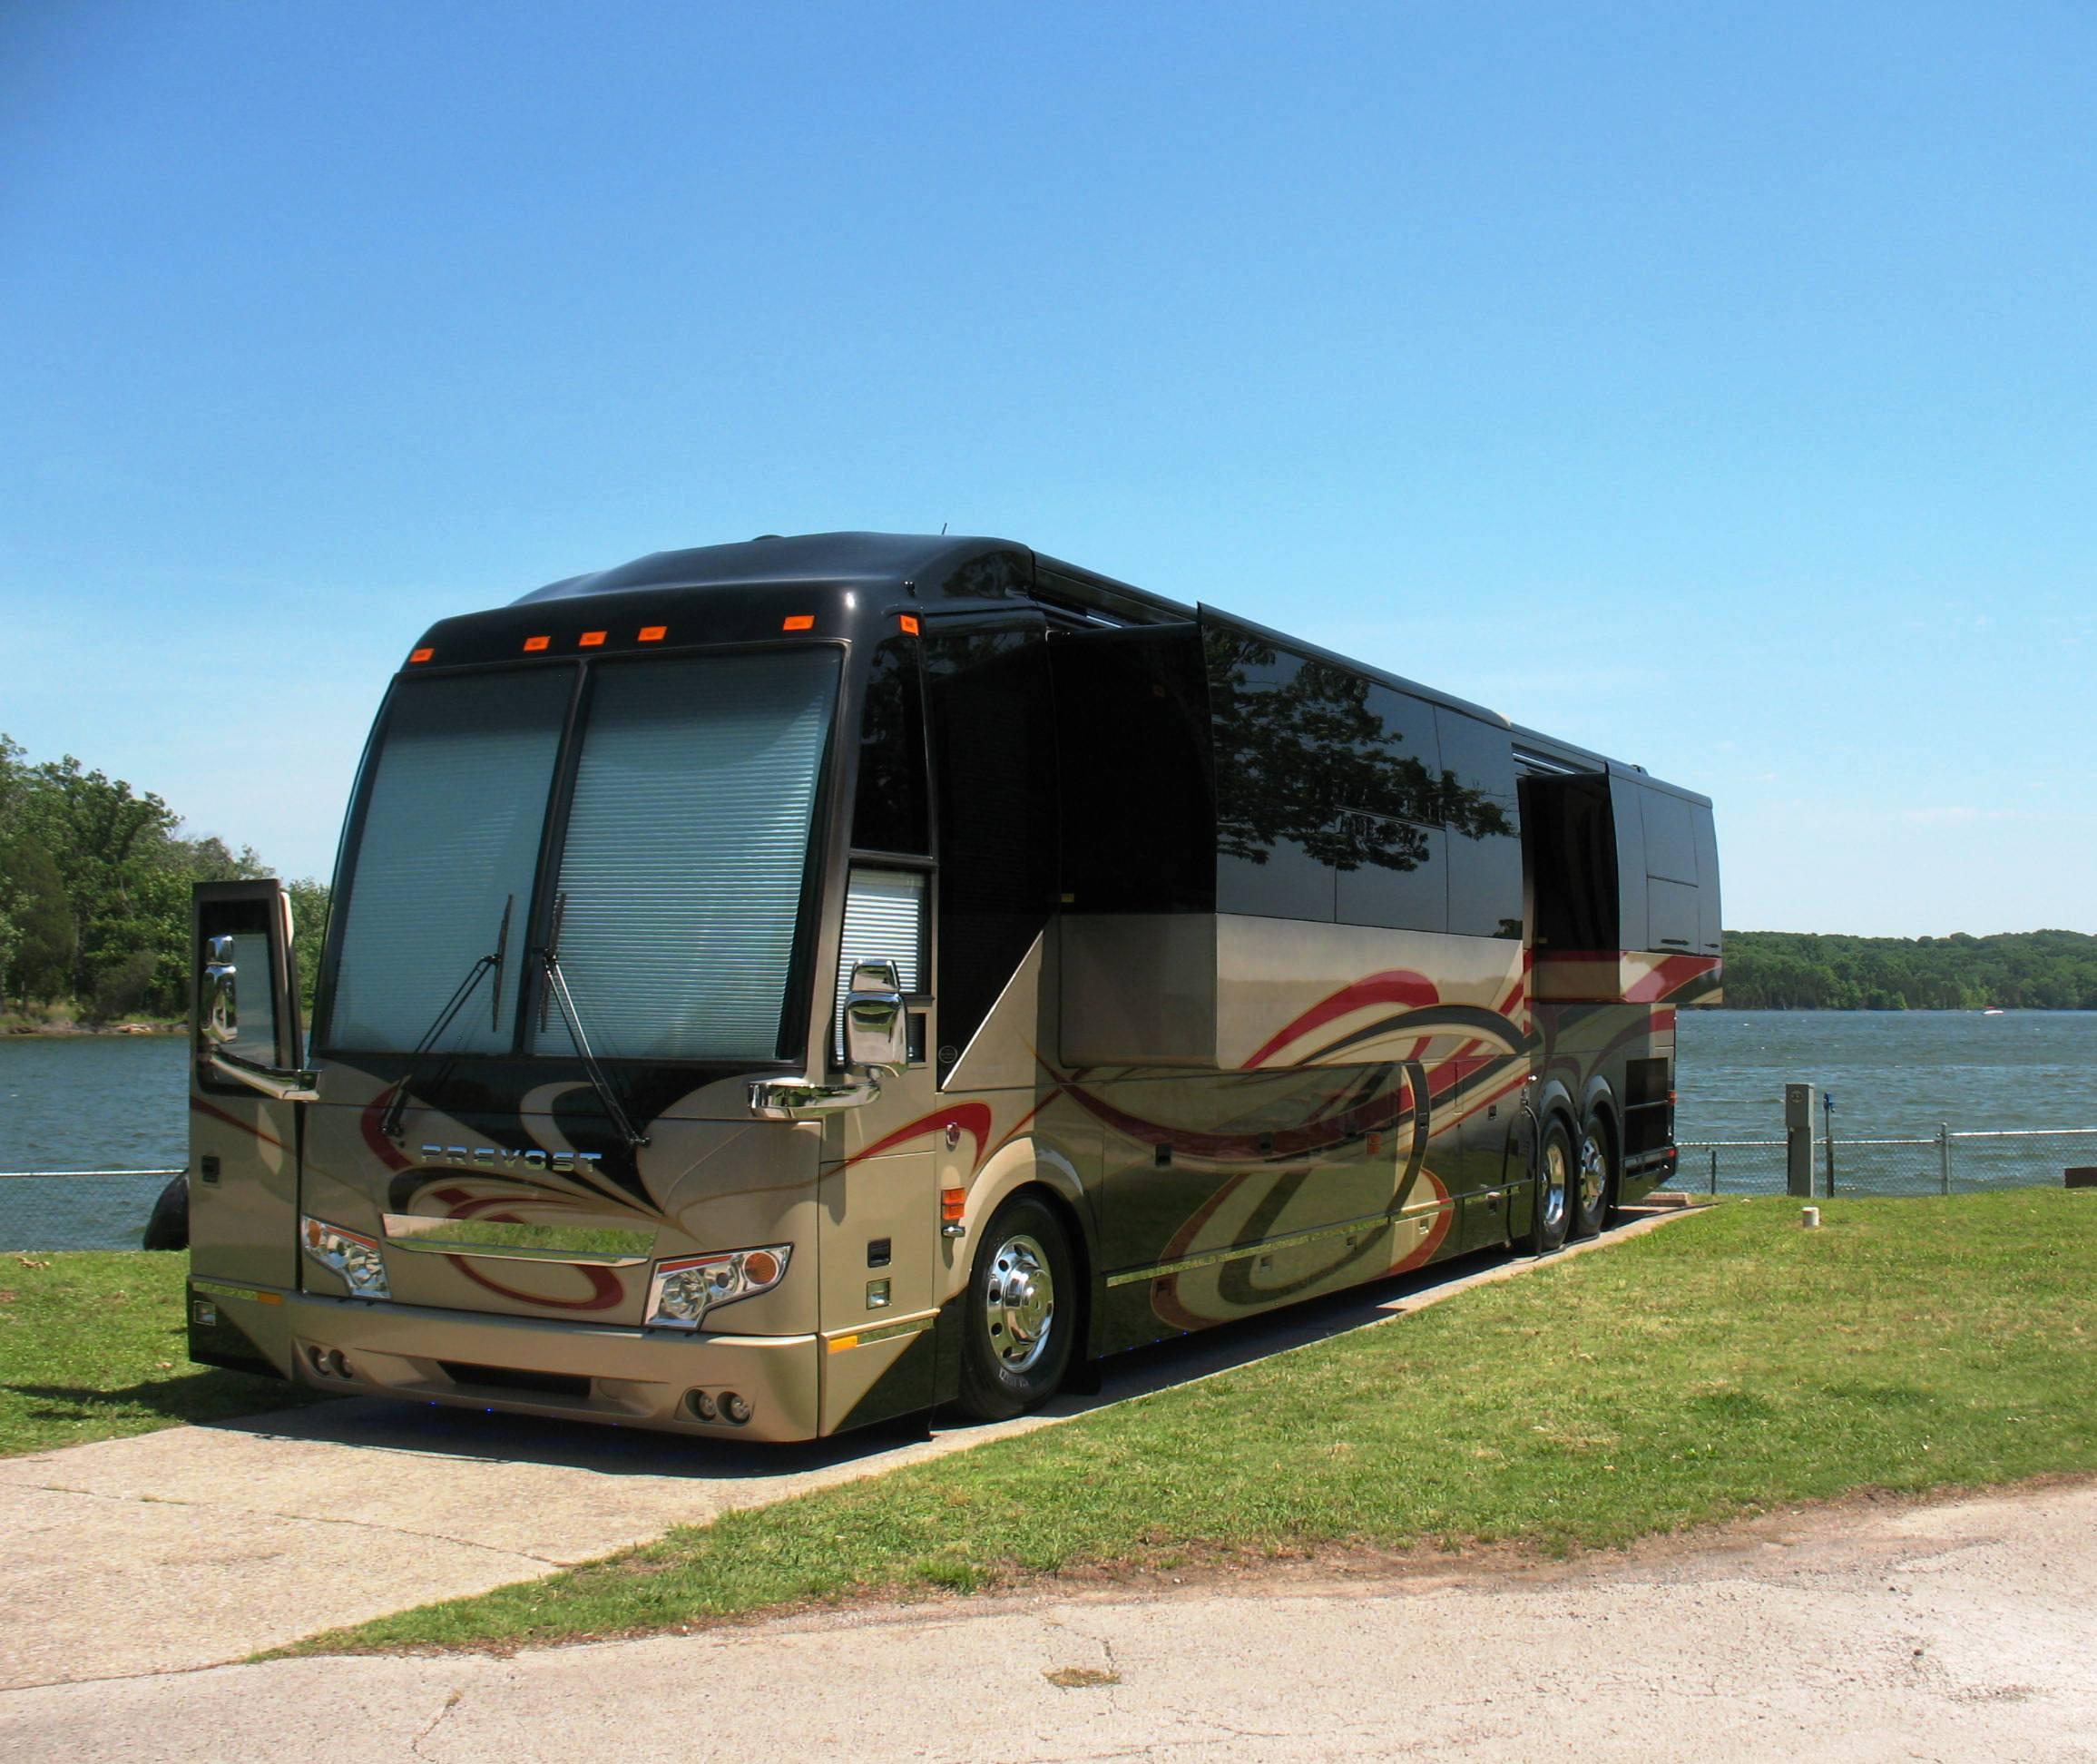 Nashville Shores Lakeside Resort - rv site by the lake